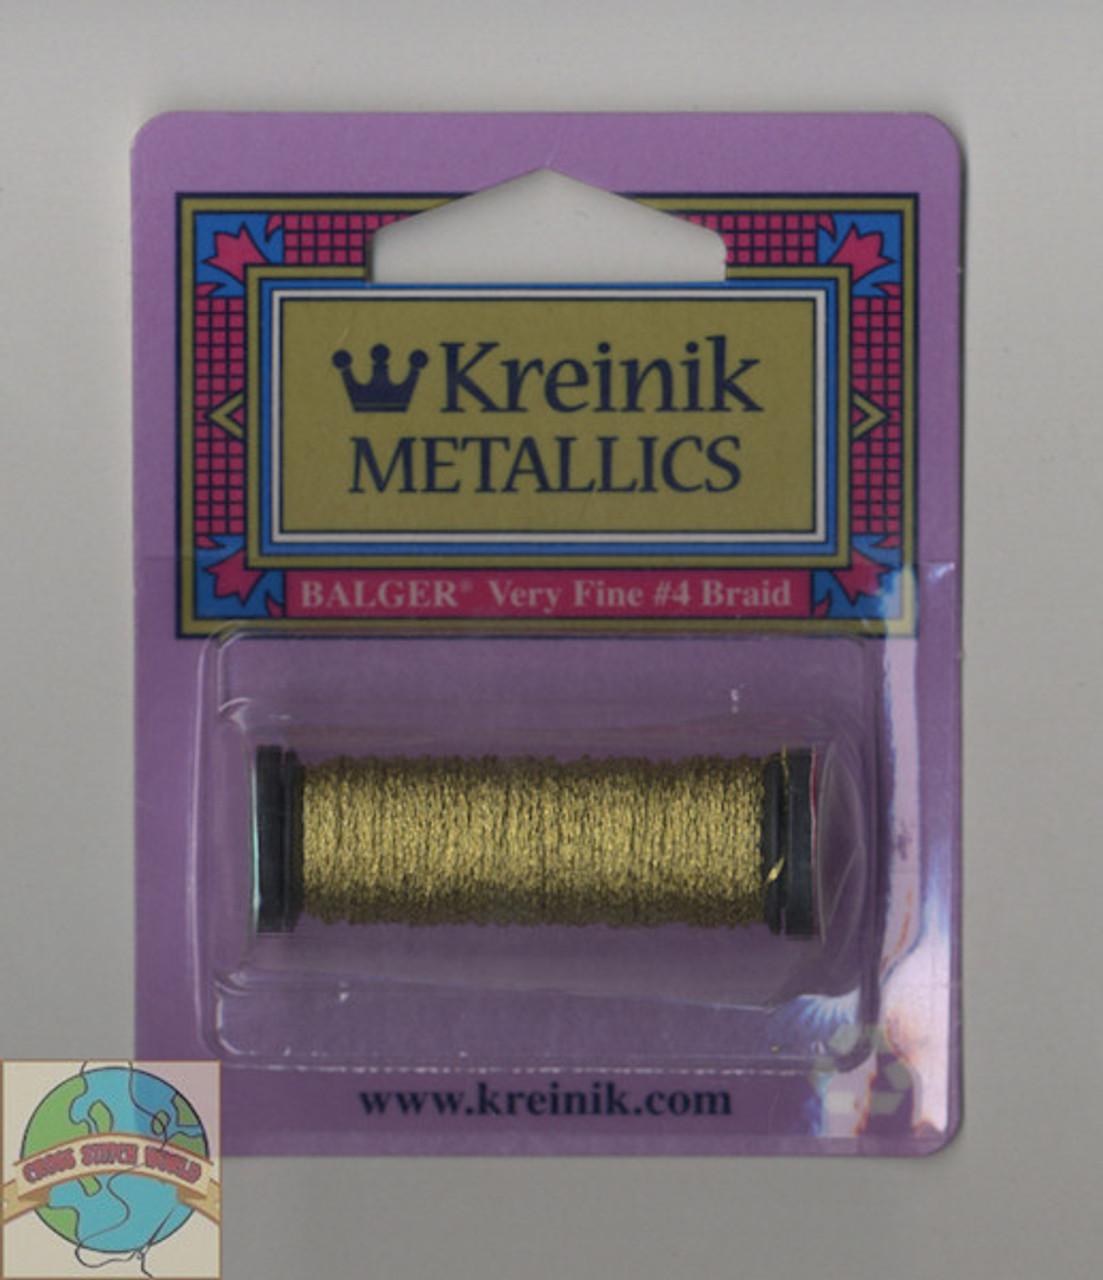 Kreinik Metallics - Very Fine #4 Gold 002C